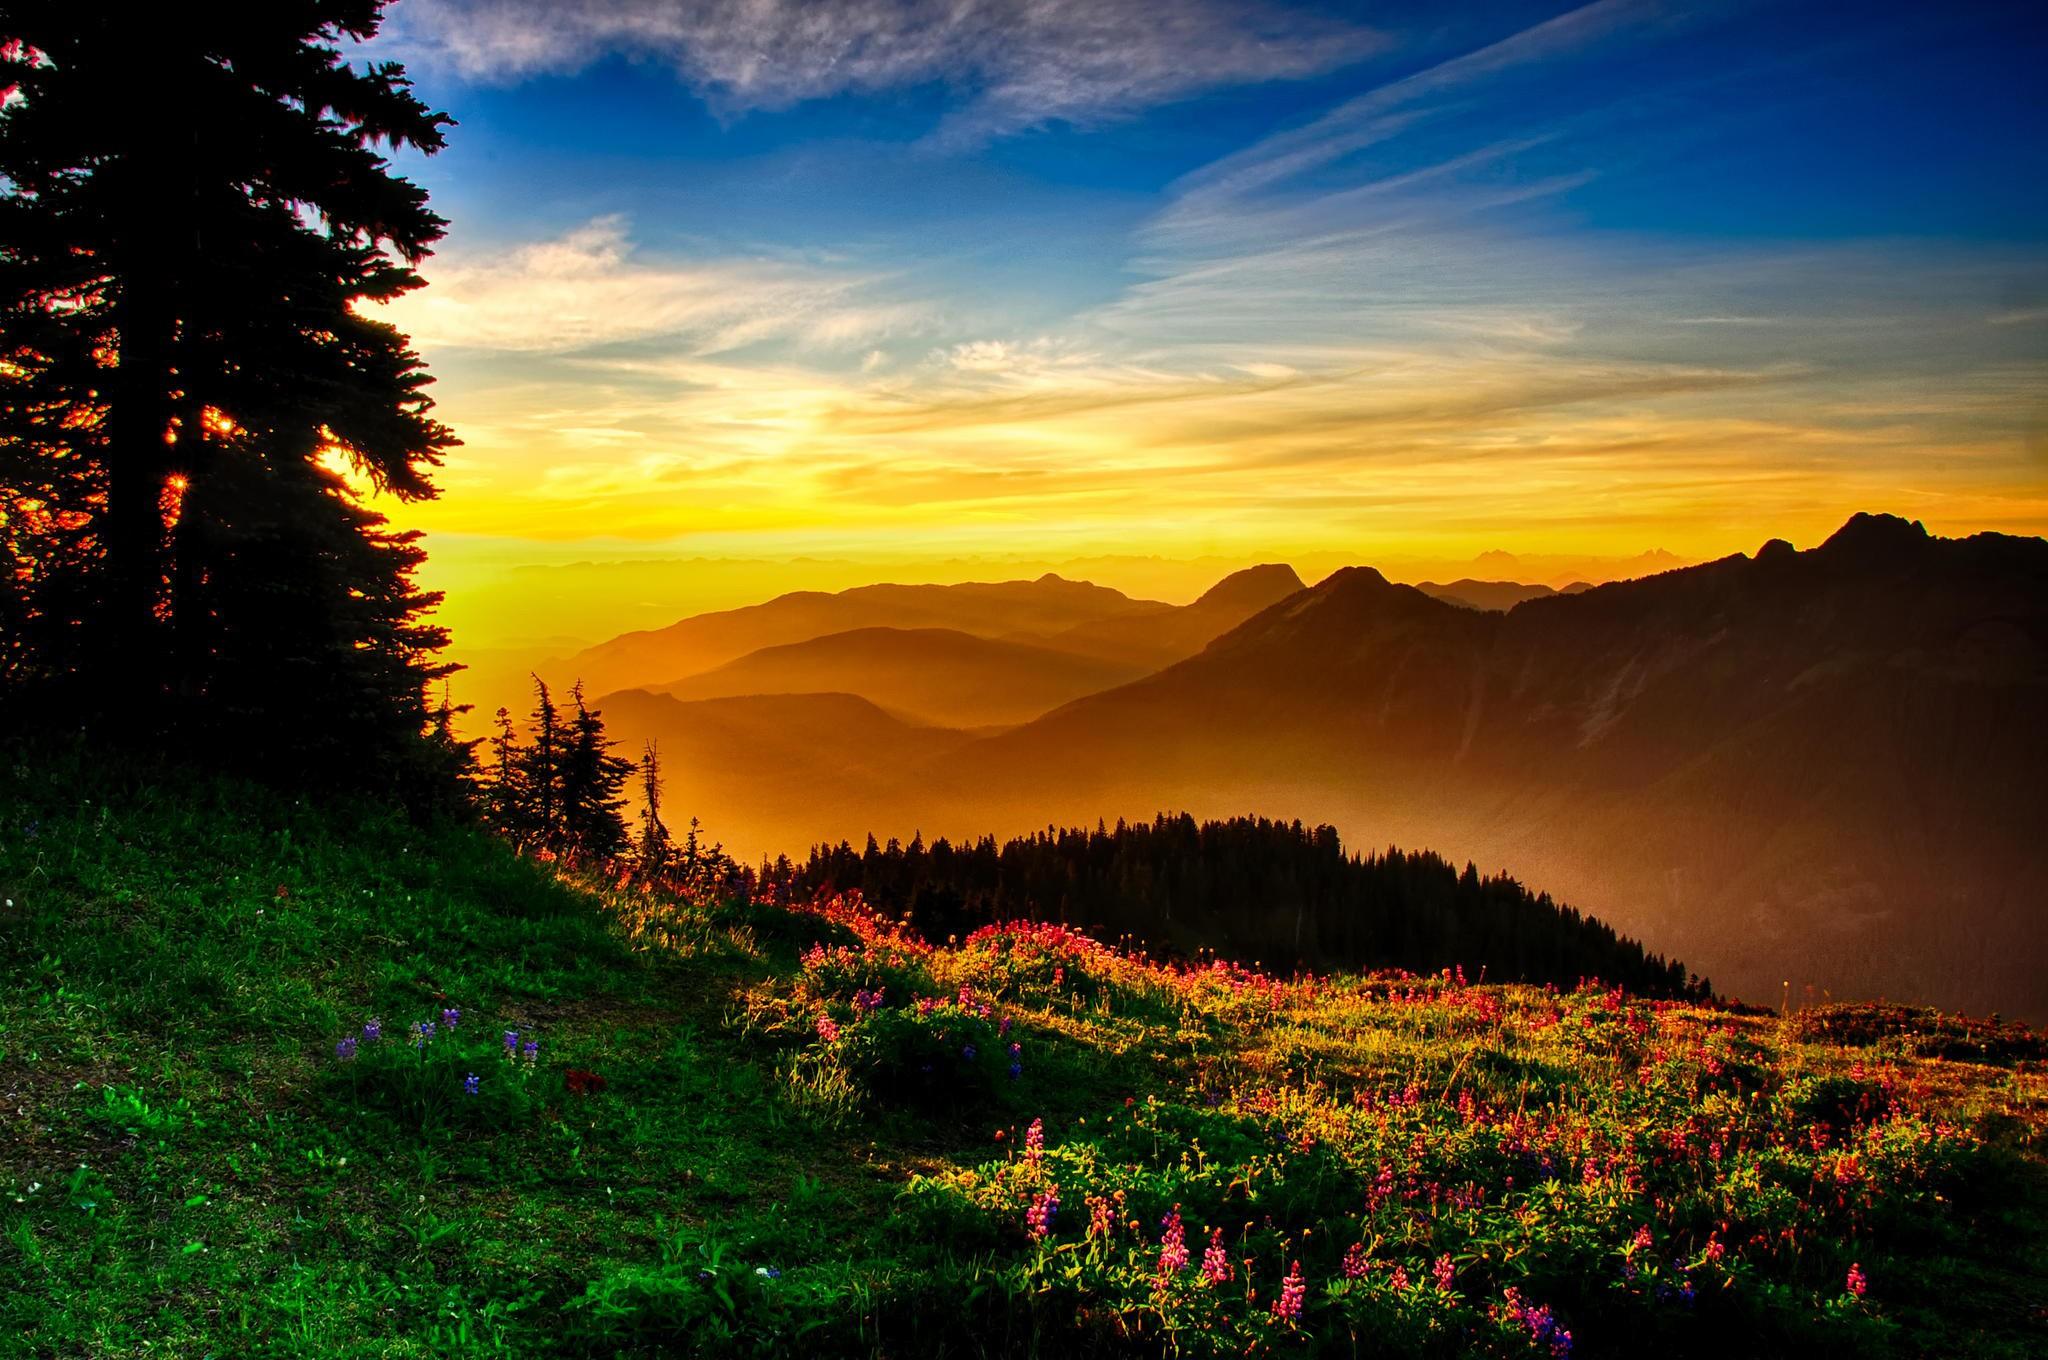 Hd Nature Wallpapers, Flowers, Windows 10, Mac Wallpaper, - Nature Windows 10 Background - HD Wallpaper